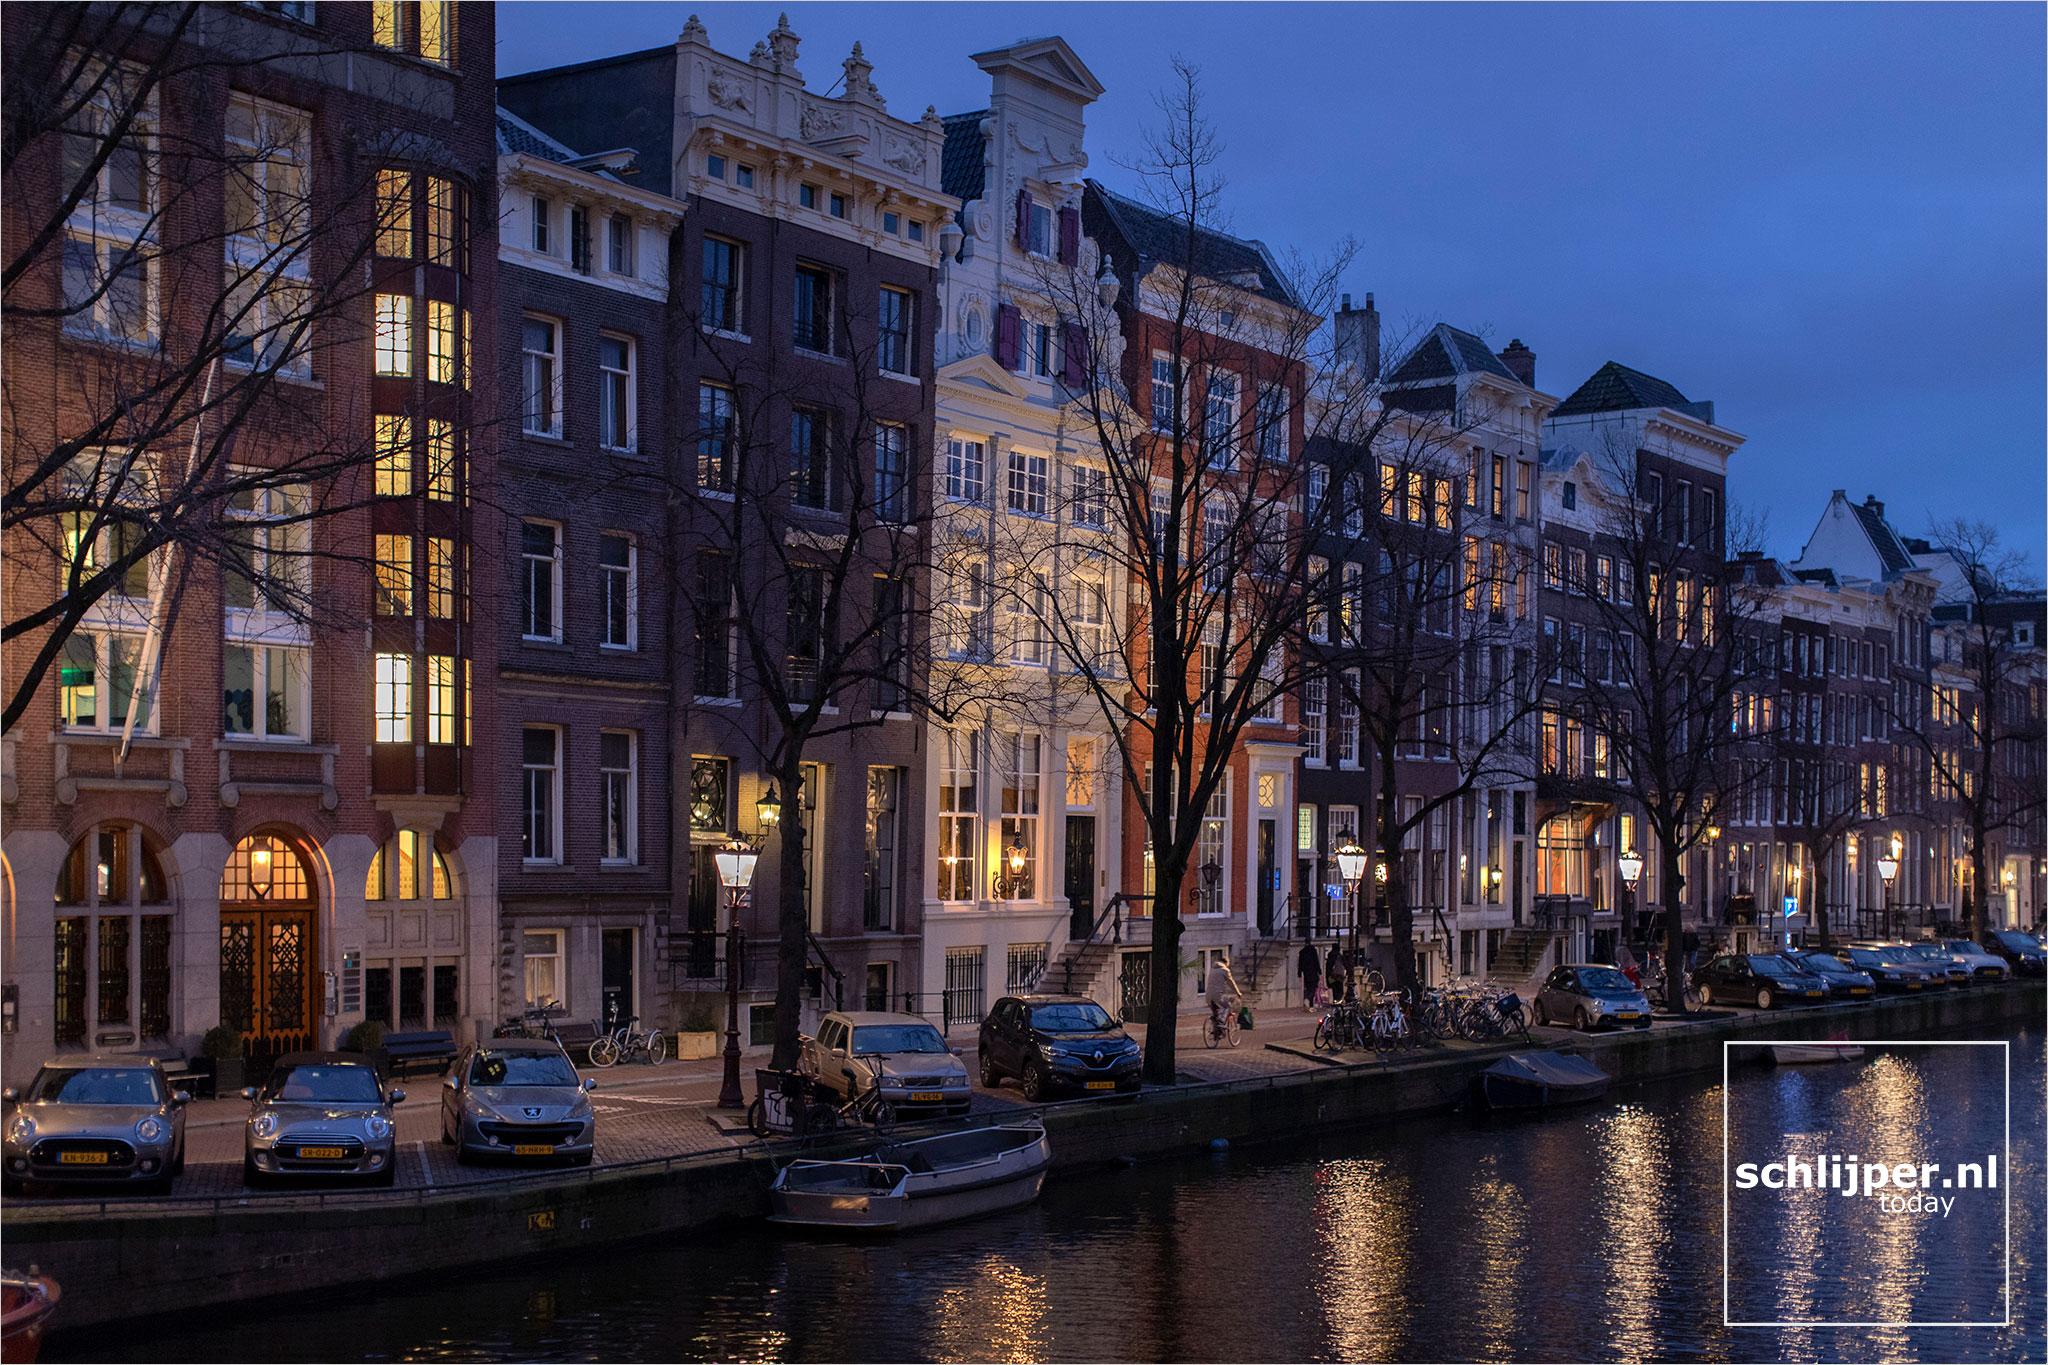 The Netherlands, Amsterdam, 3 januari 2021